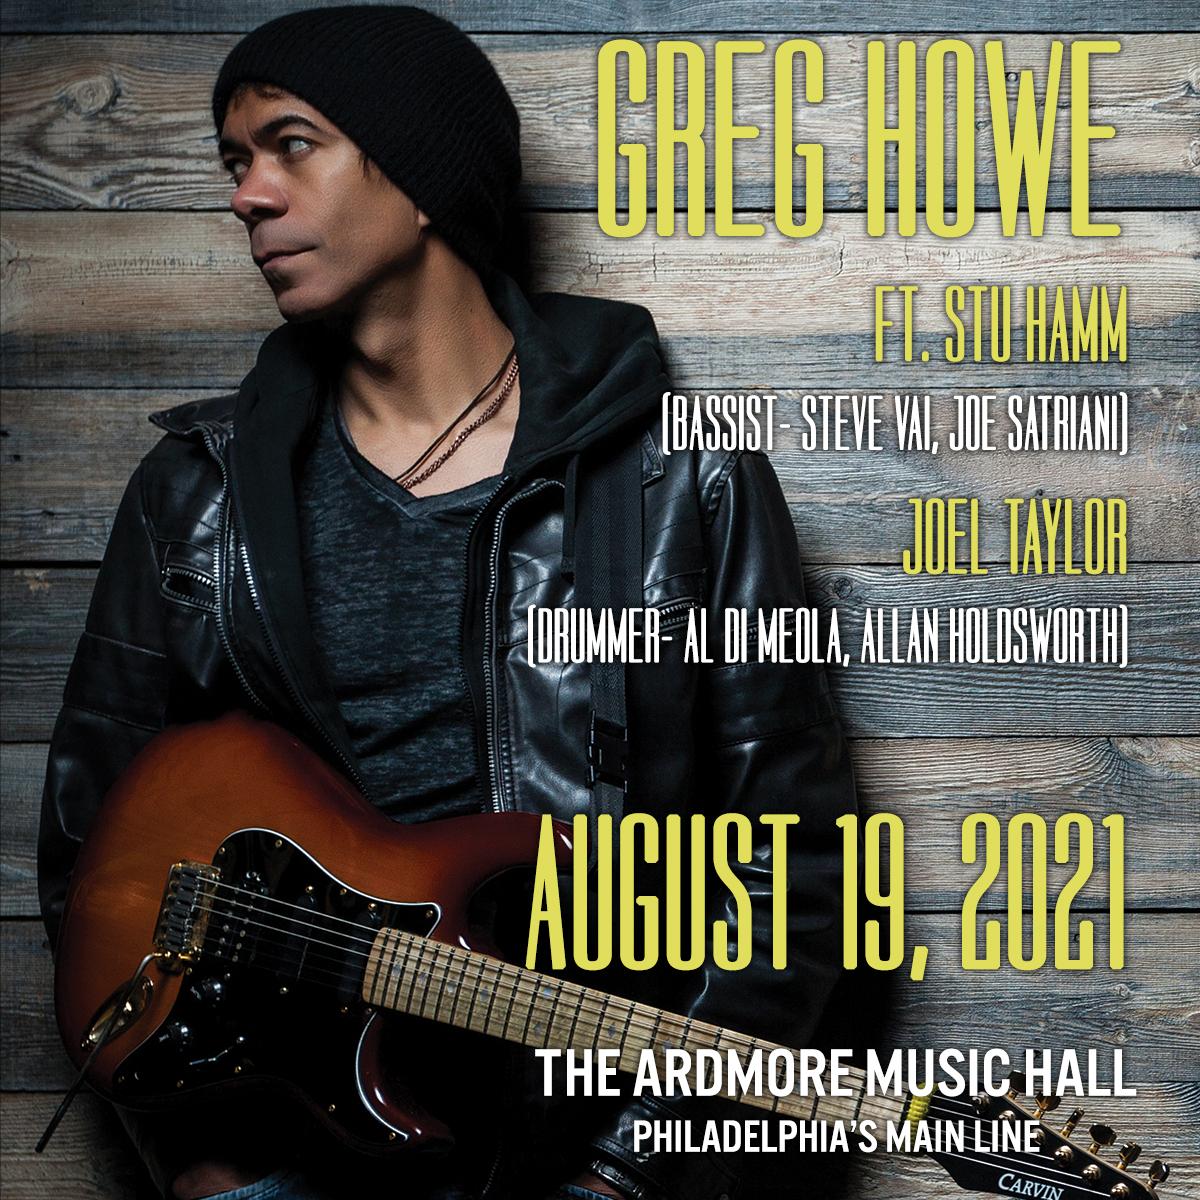 Greg Howe ft. Stu Hamm + Joel Taylor: Main Image